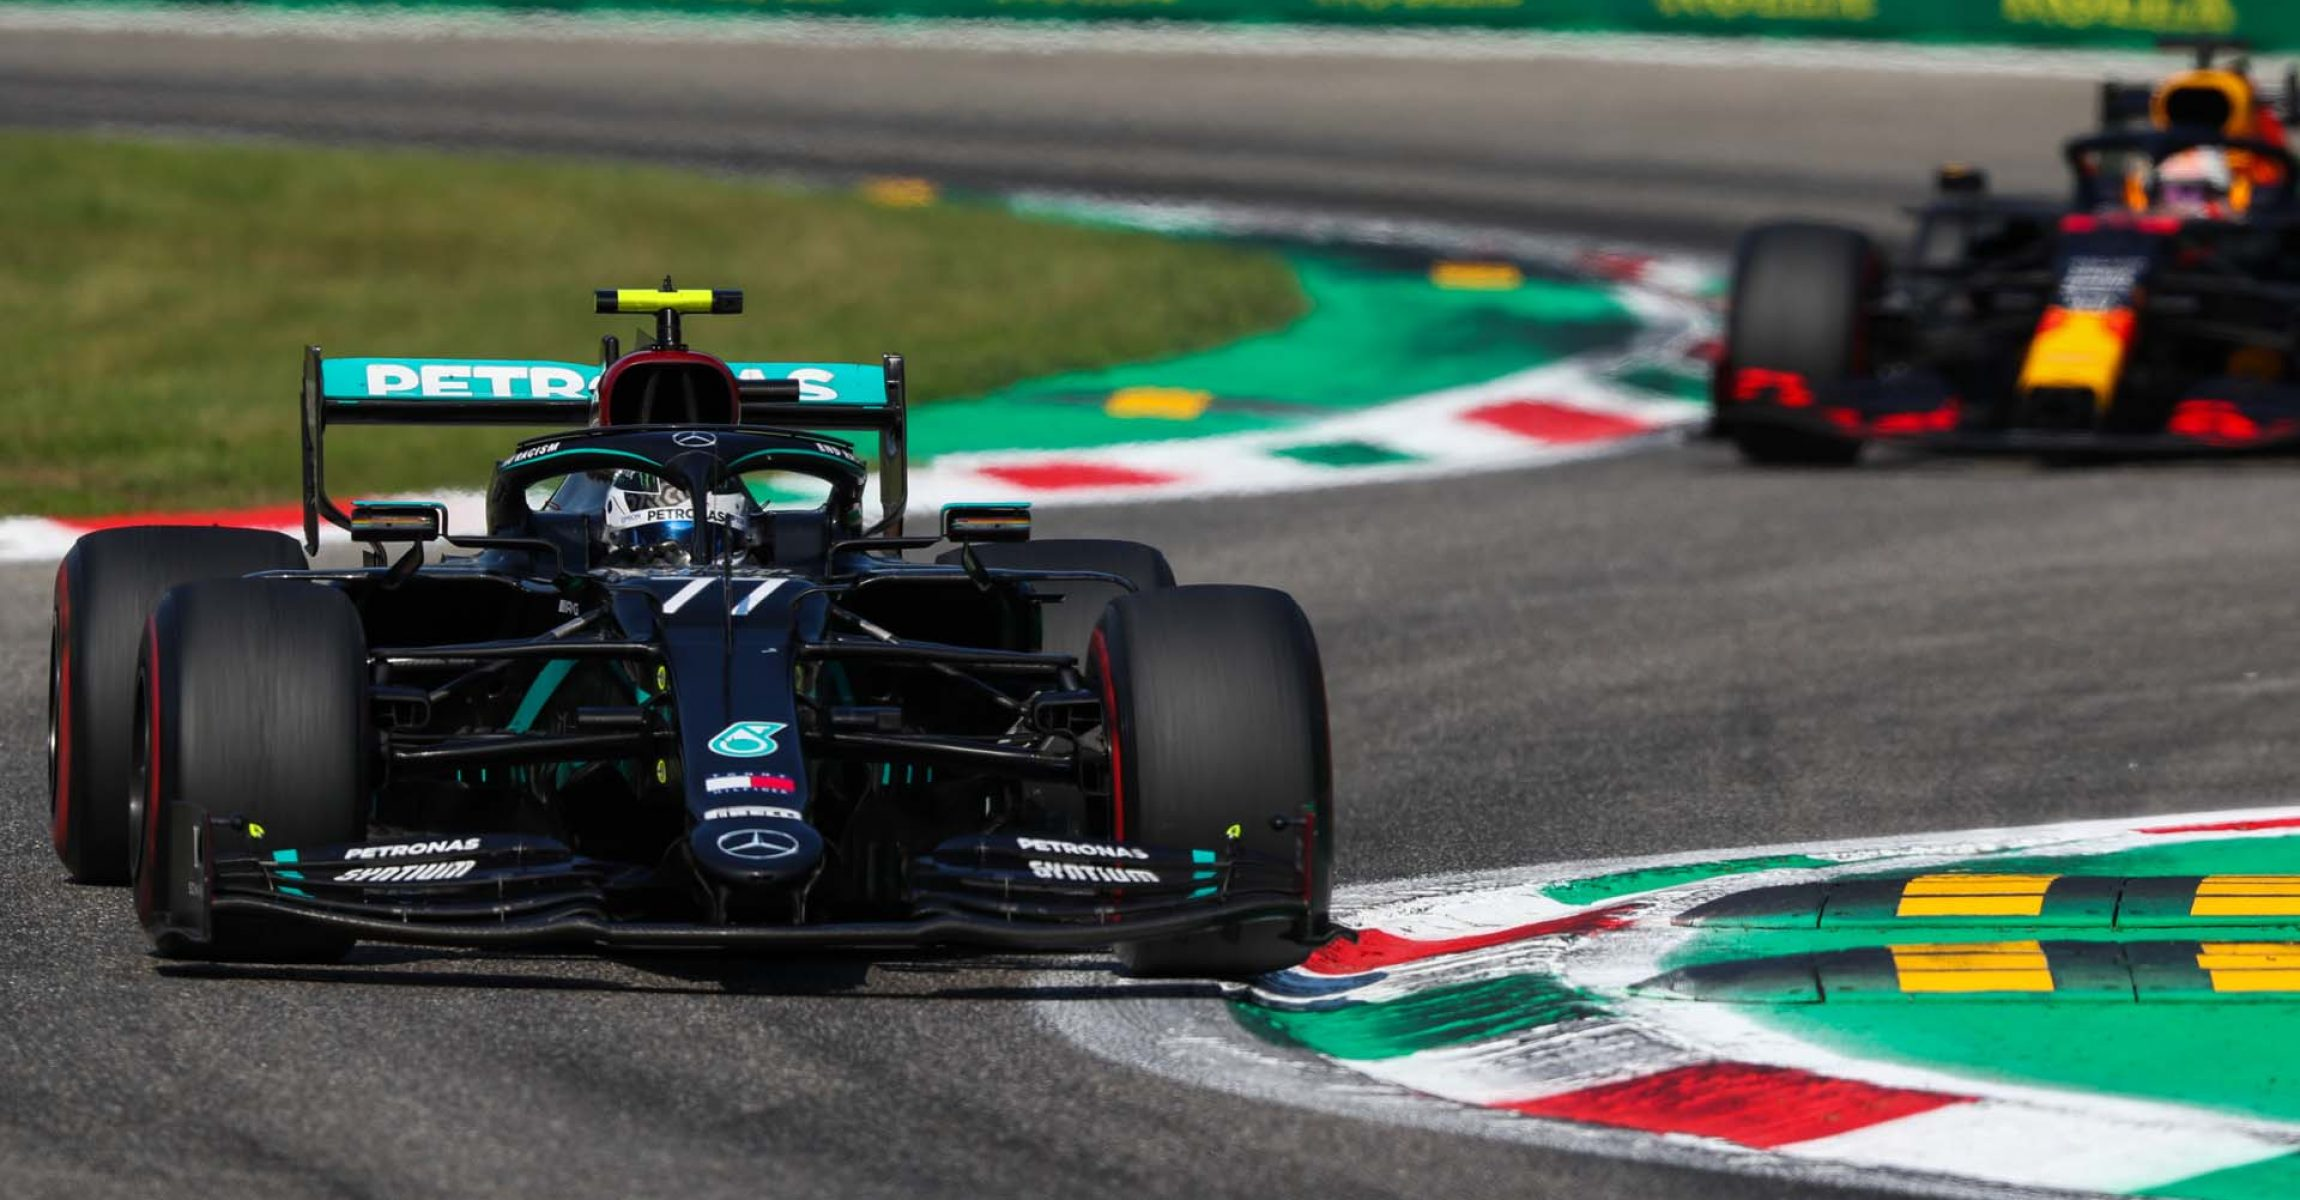 2020 Italian Grand Prix, Sunday - LAT Images Valtteri Bottas Mercedes